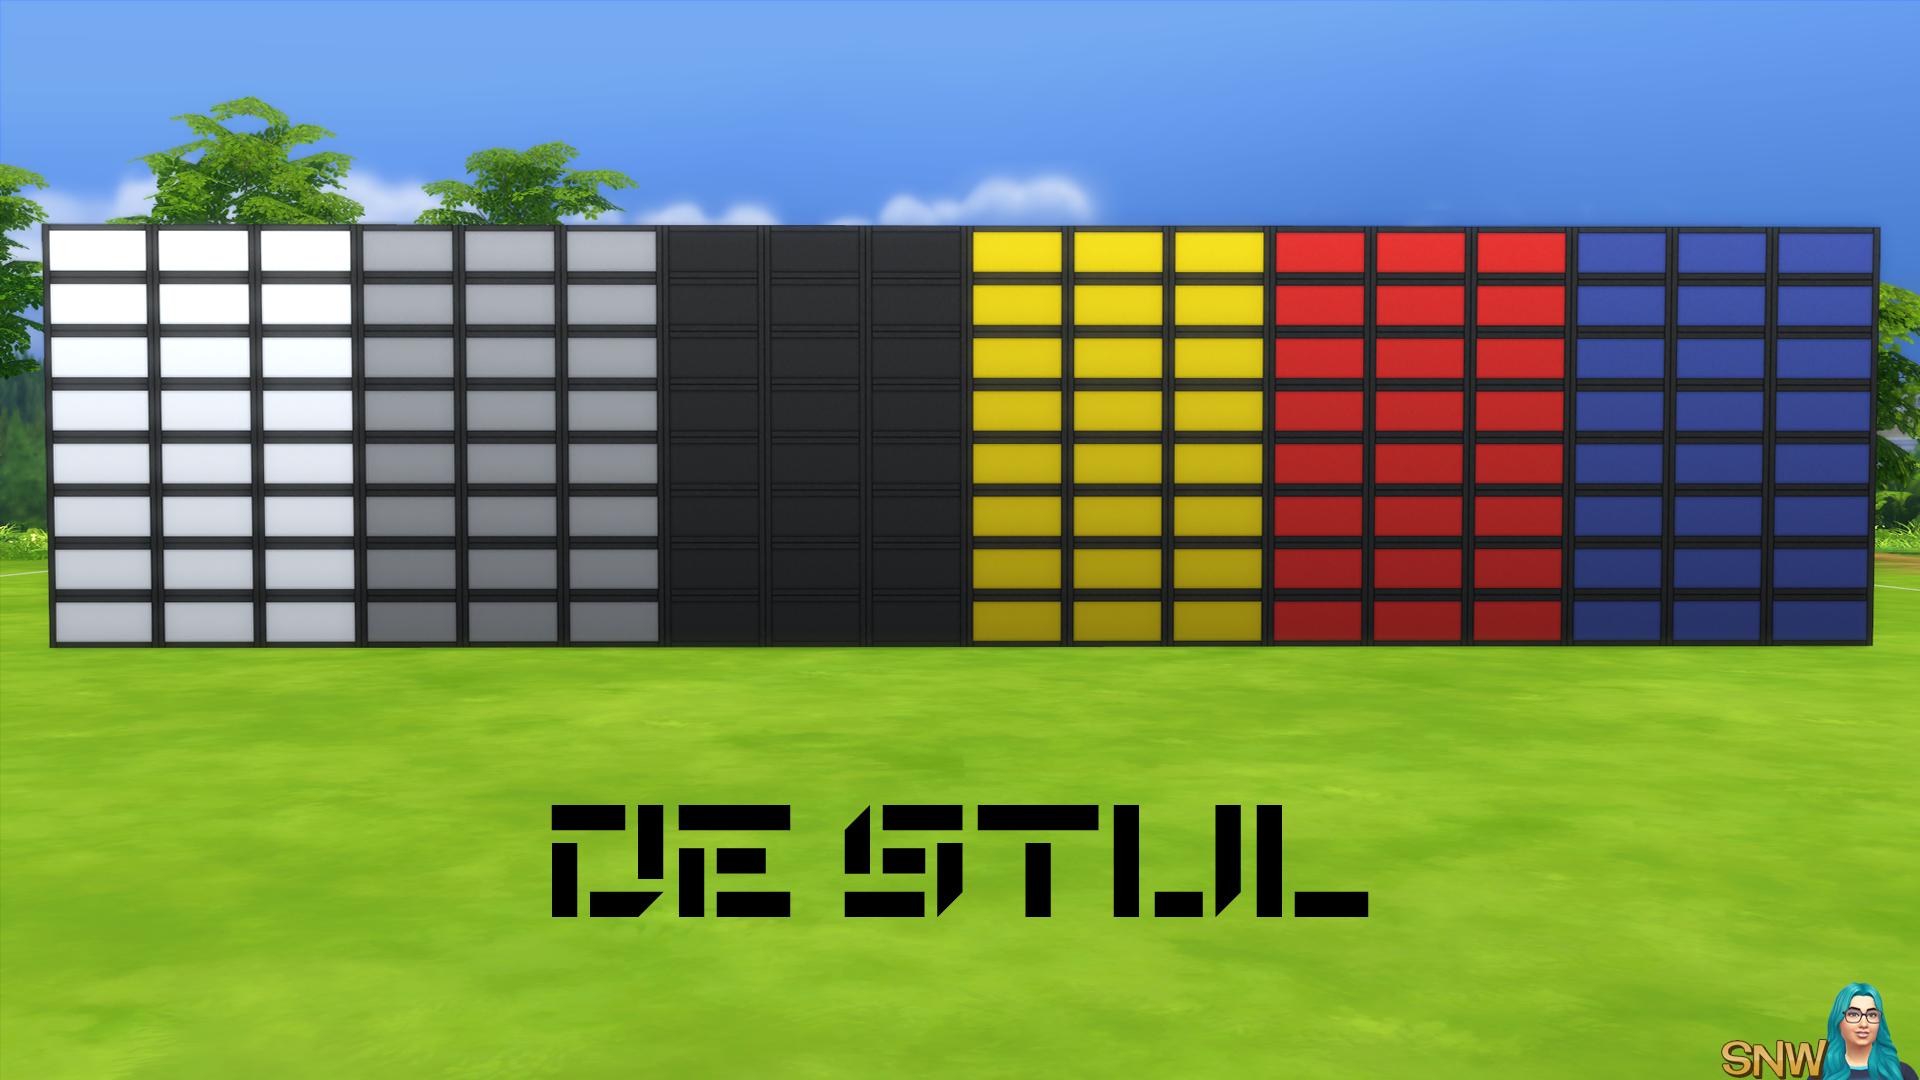 De Stijl Walls for The Sims 4